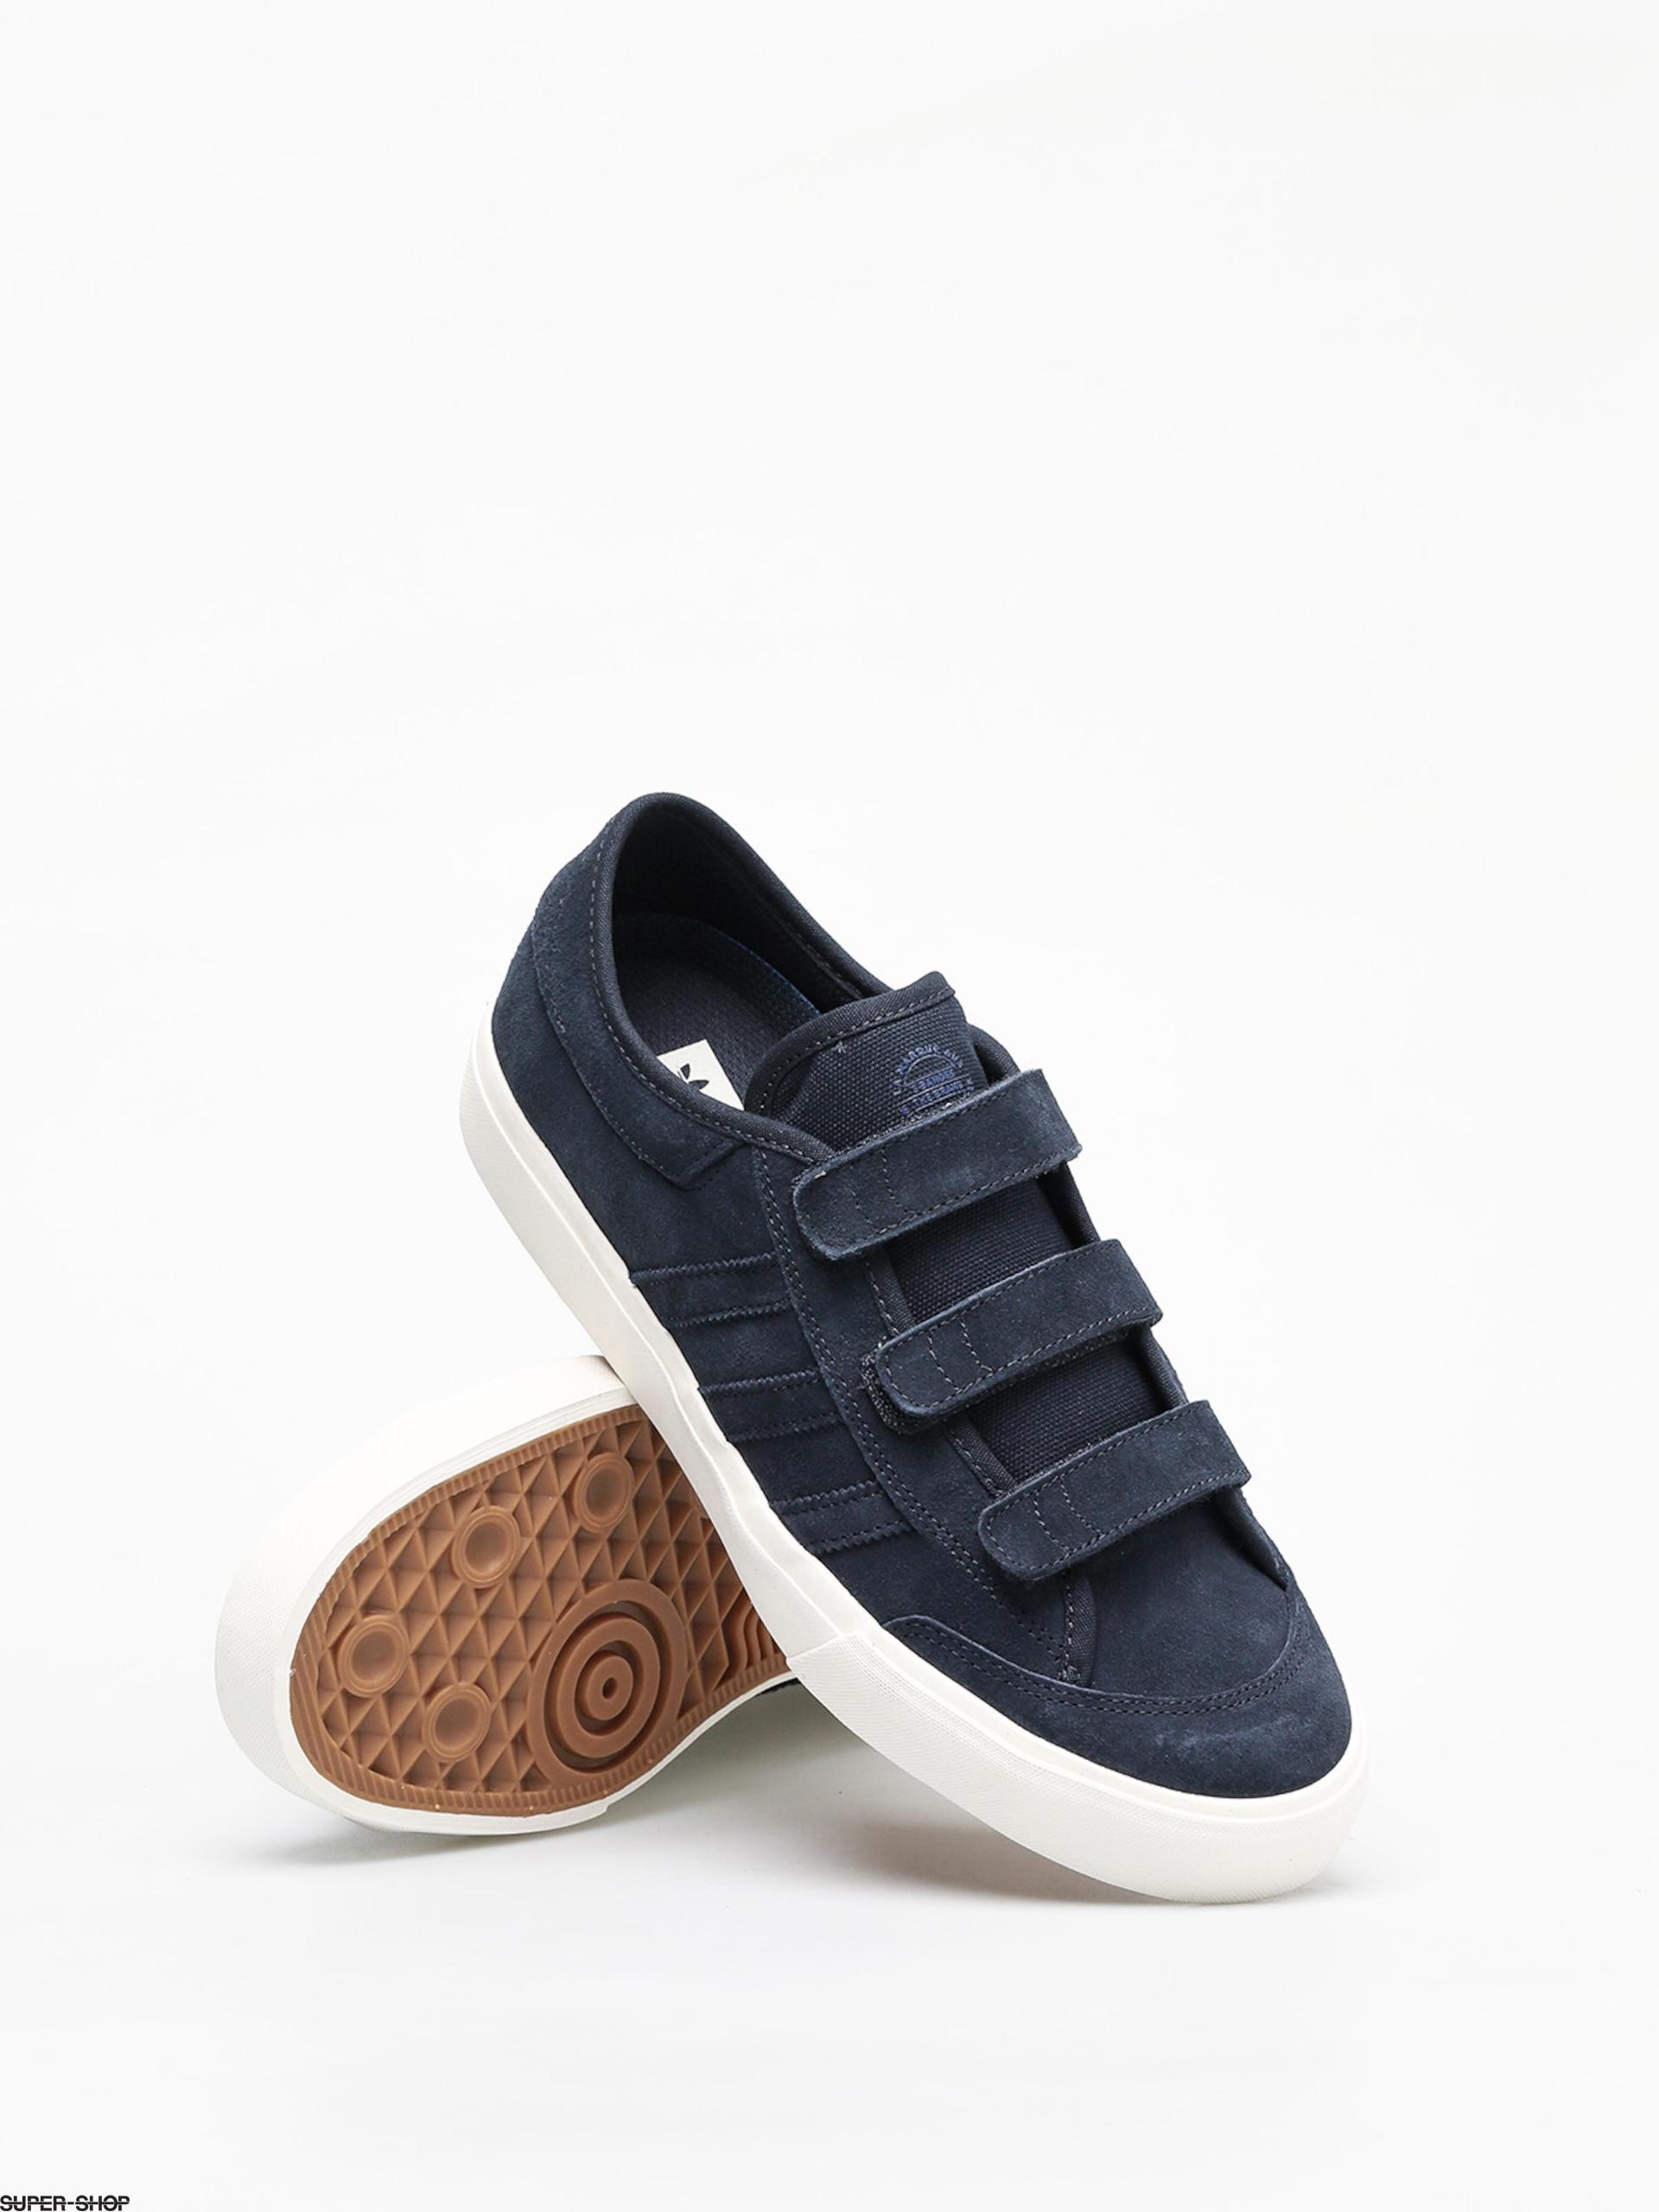 Adidas Matchcourt adidas Matchcourt Cf Shoes (ntnavy/dkblue/owhite)